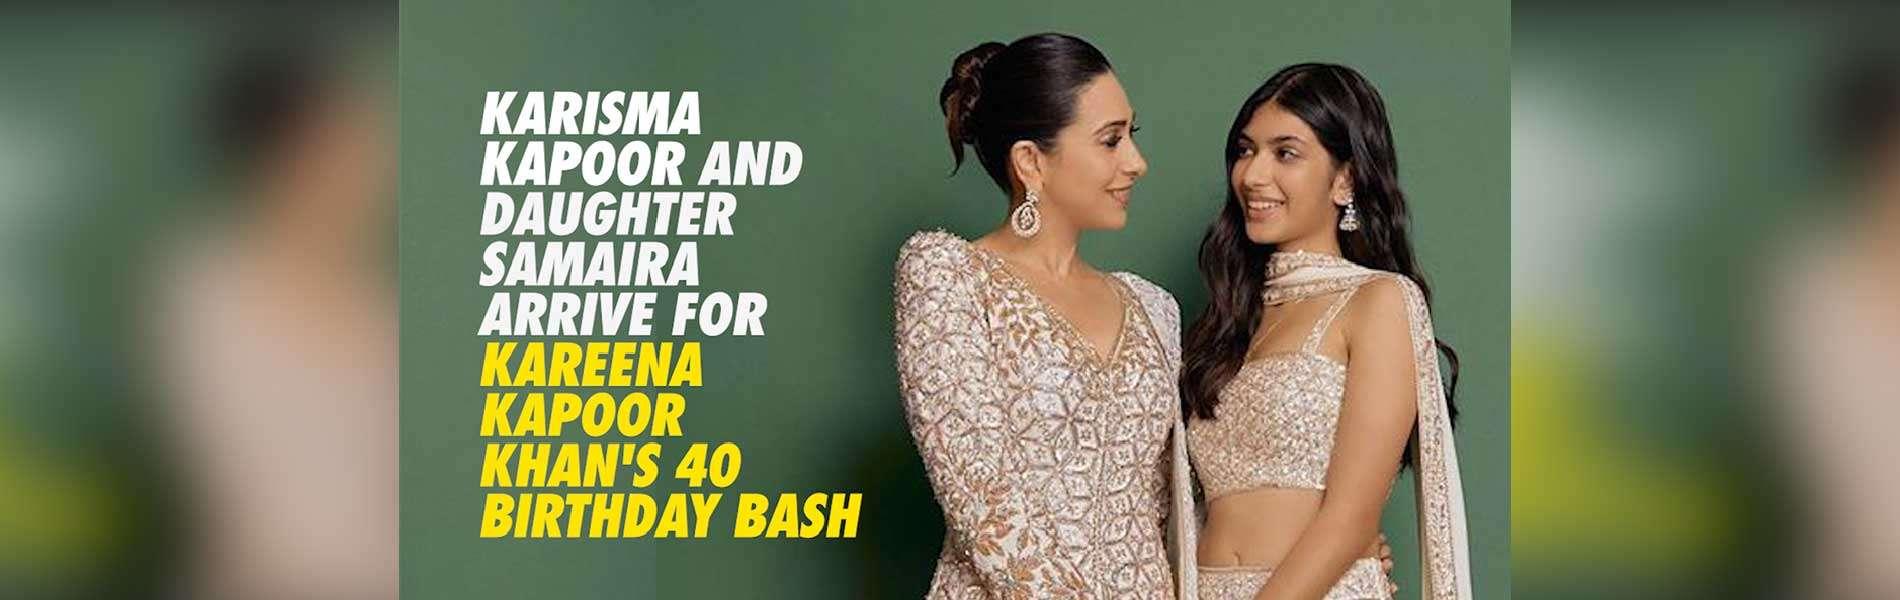 karisma-kapoor-and-daughter-samaira-arrive-for-kareena-kapoor-khans-40-birthday-bash